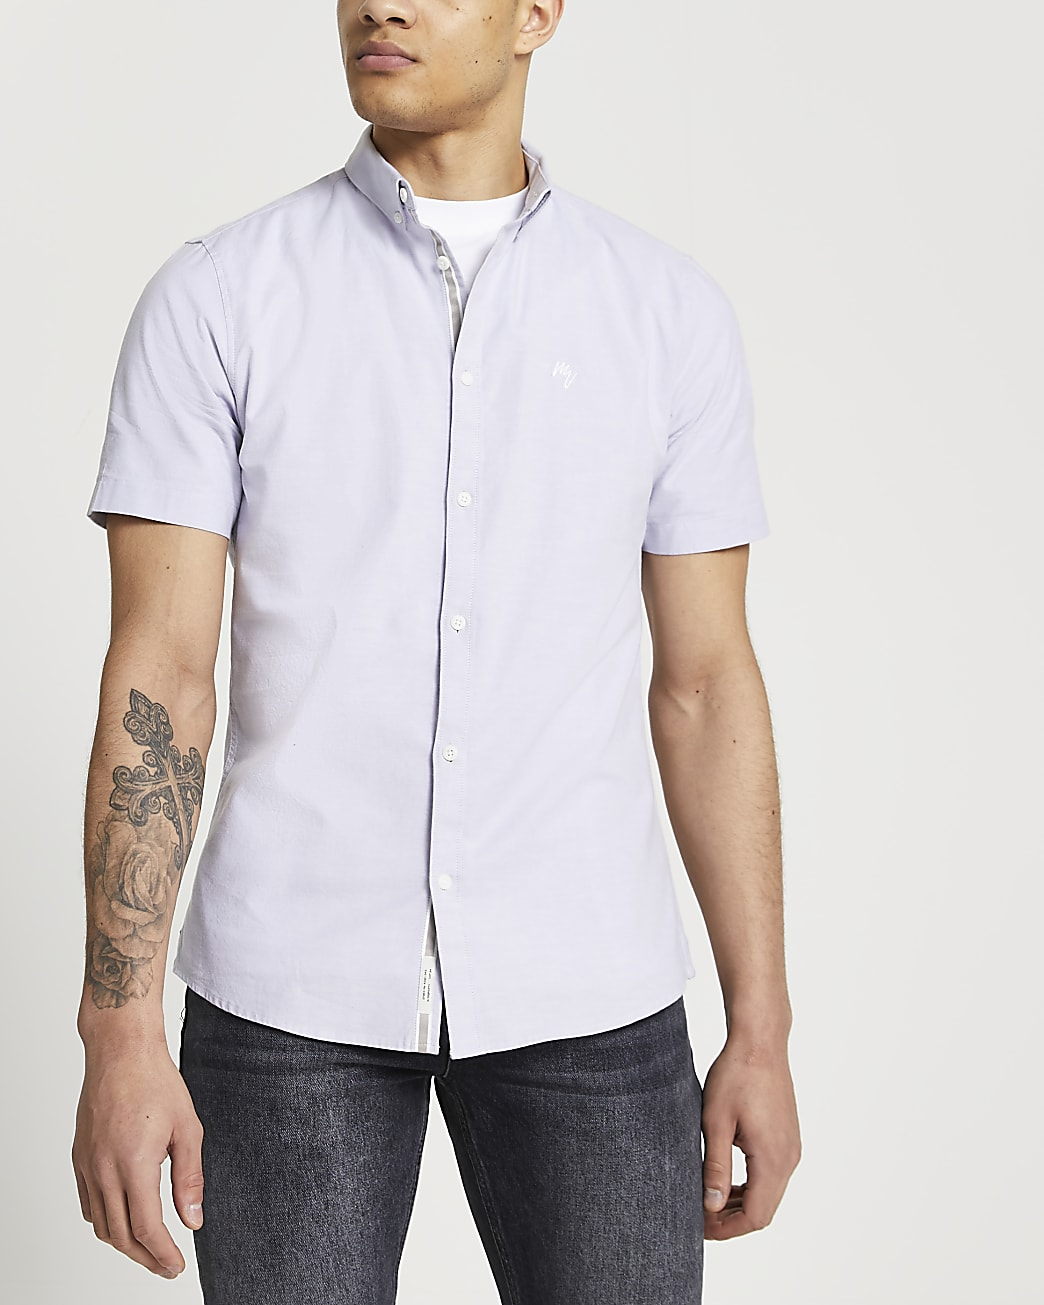 Maison Riviera purple slim short sleeve shirt